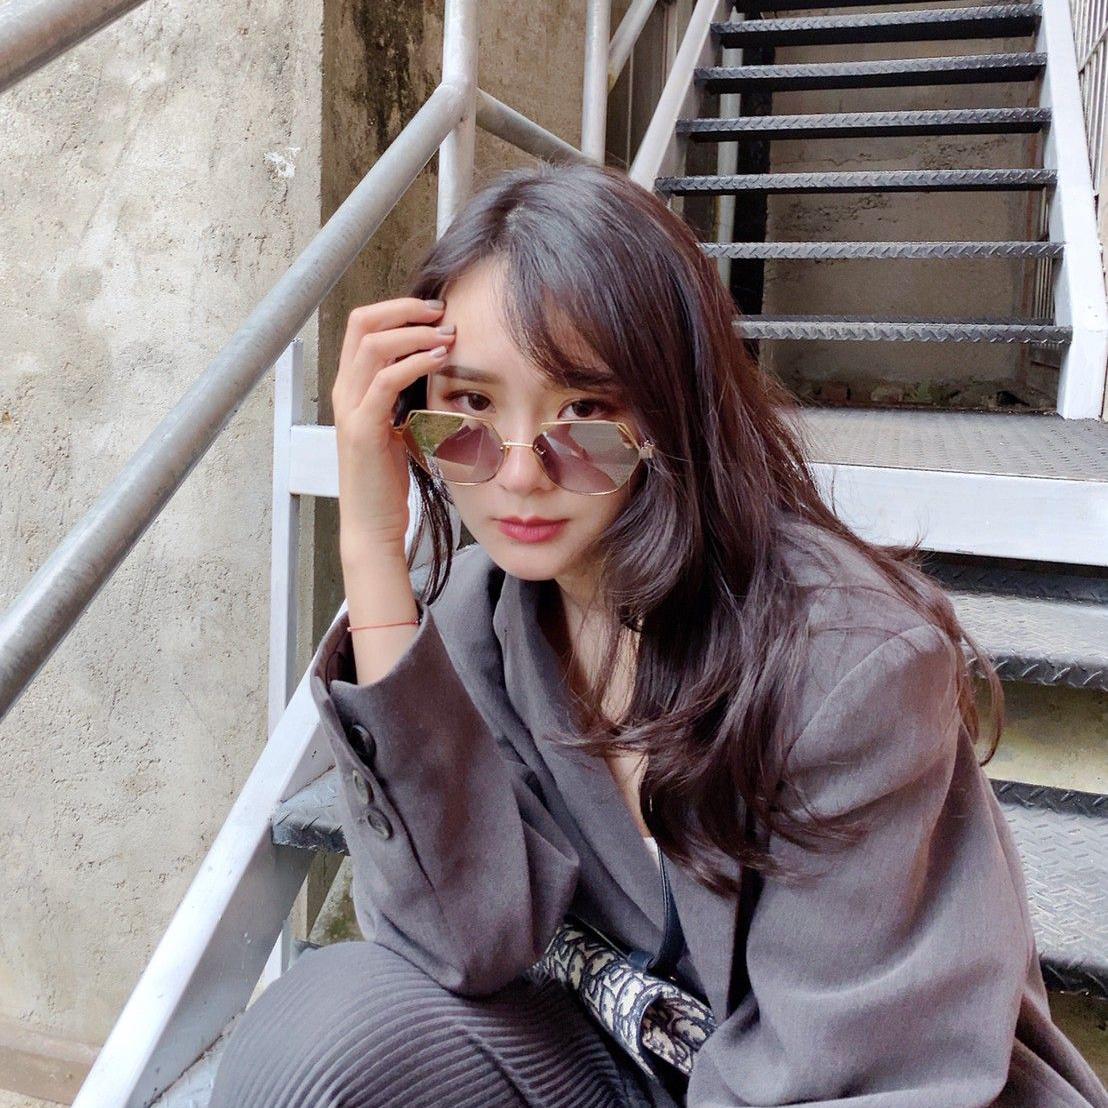 irene yuyu, spektre molly